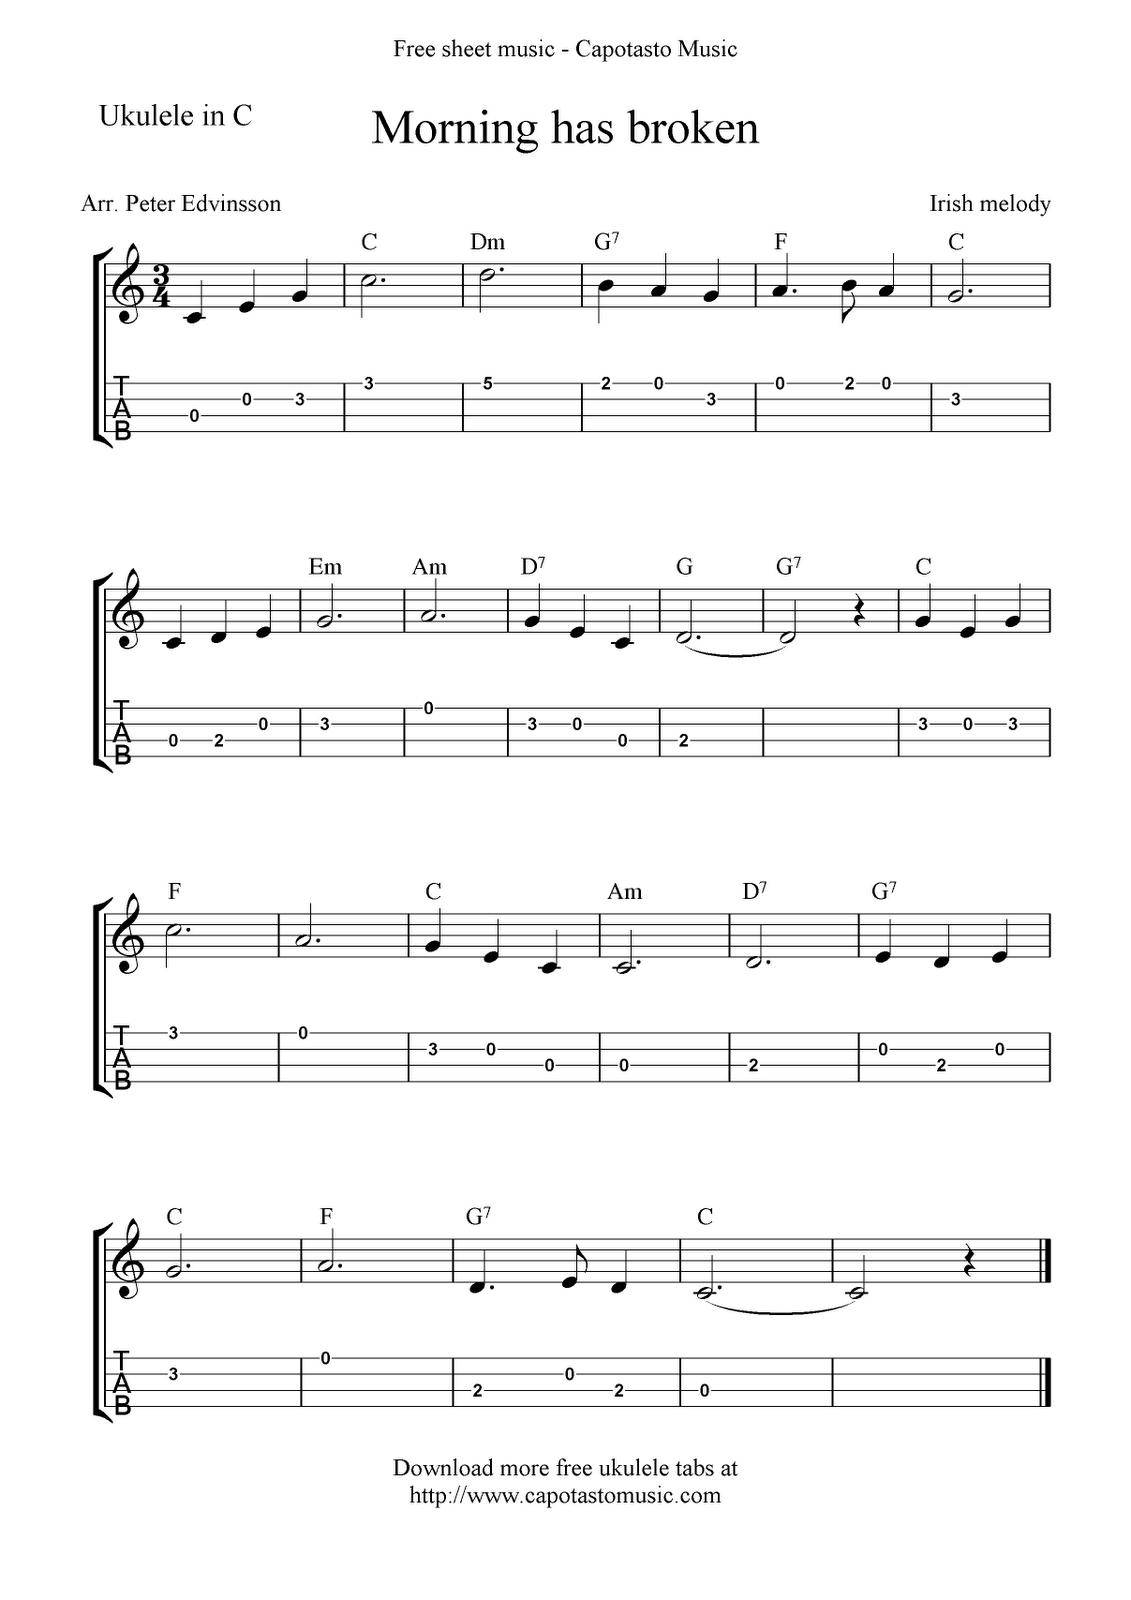 Free Ukulele Sheet Music | Free Sheet Music Scores ...